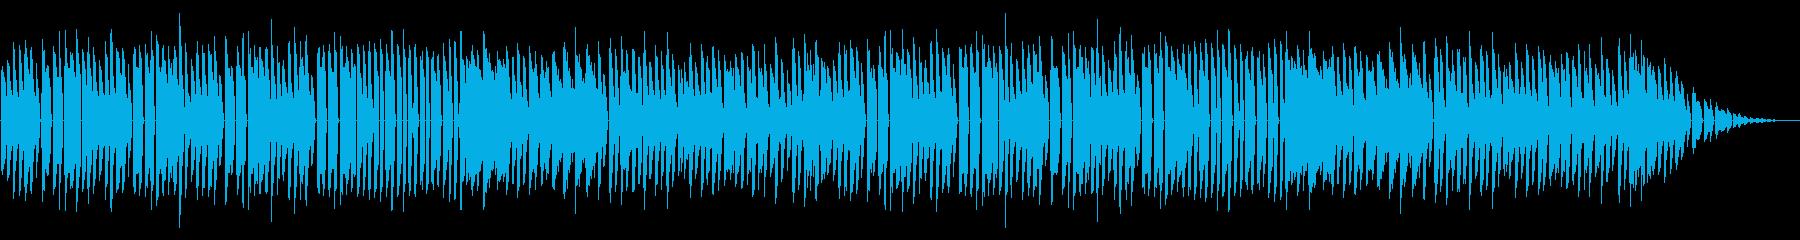 NES アクションD05-1(ステージ4の再生済みの波形